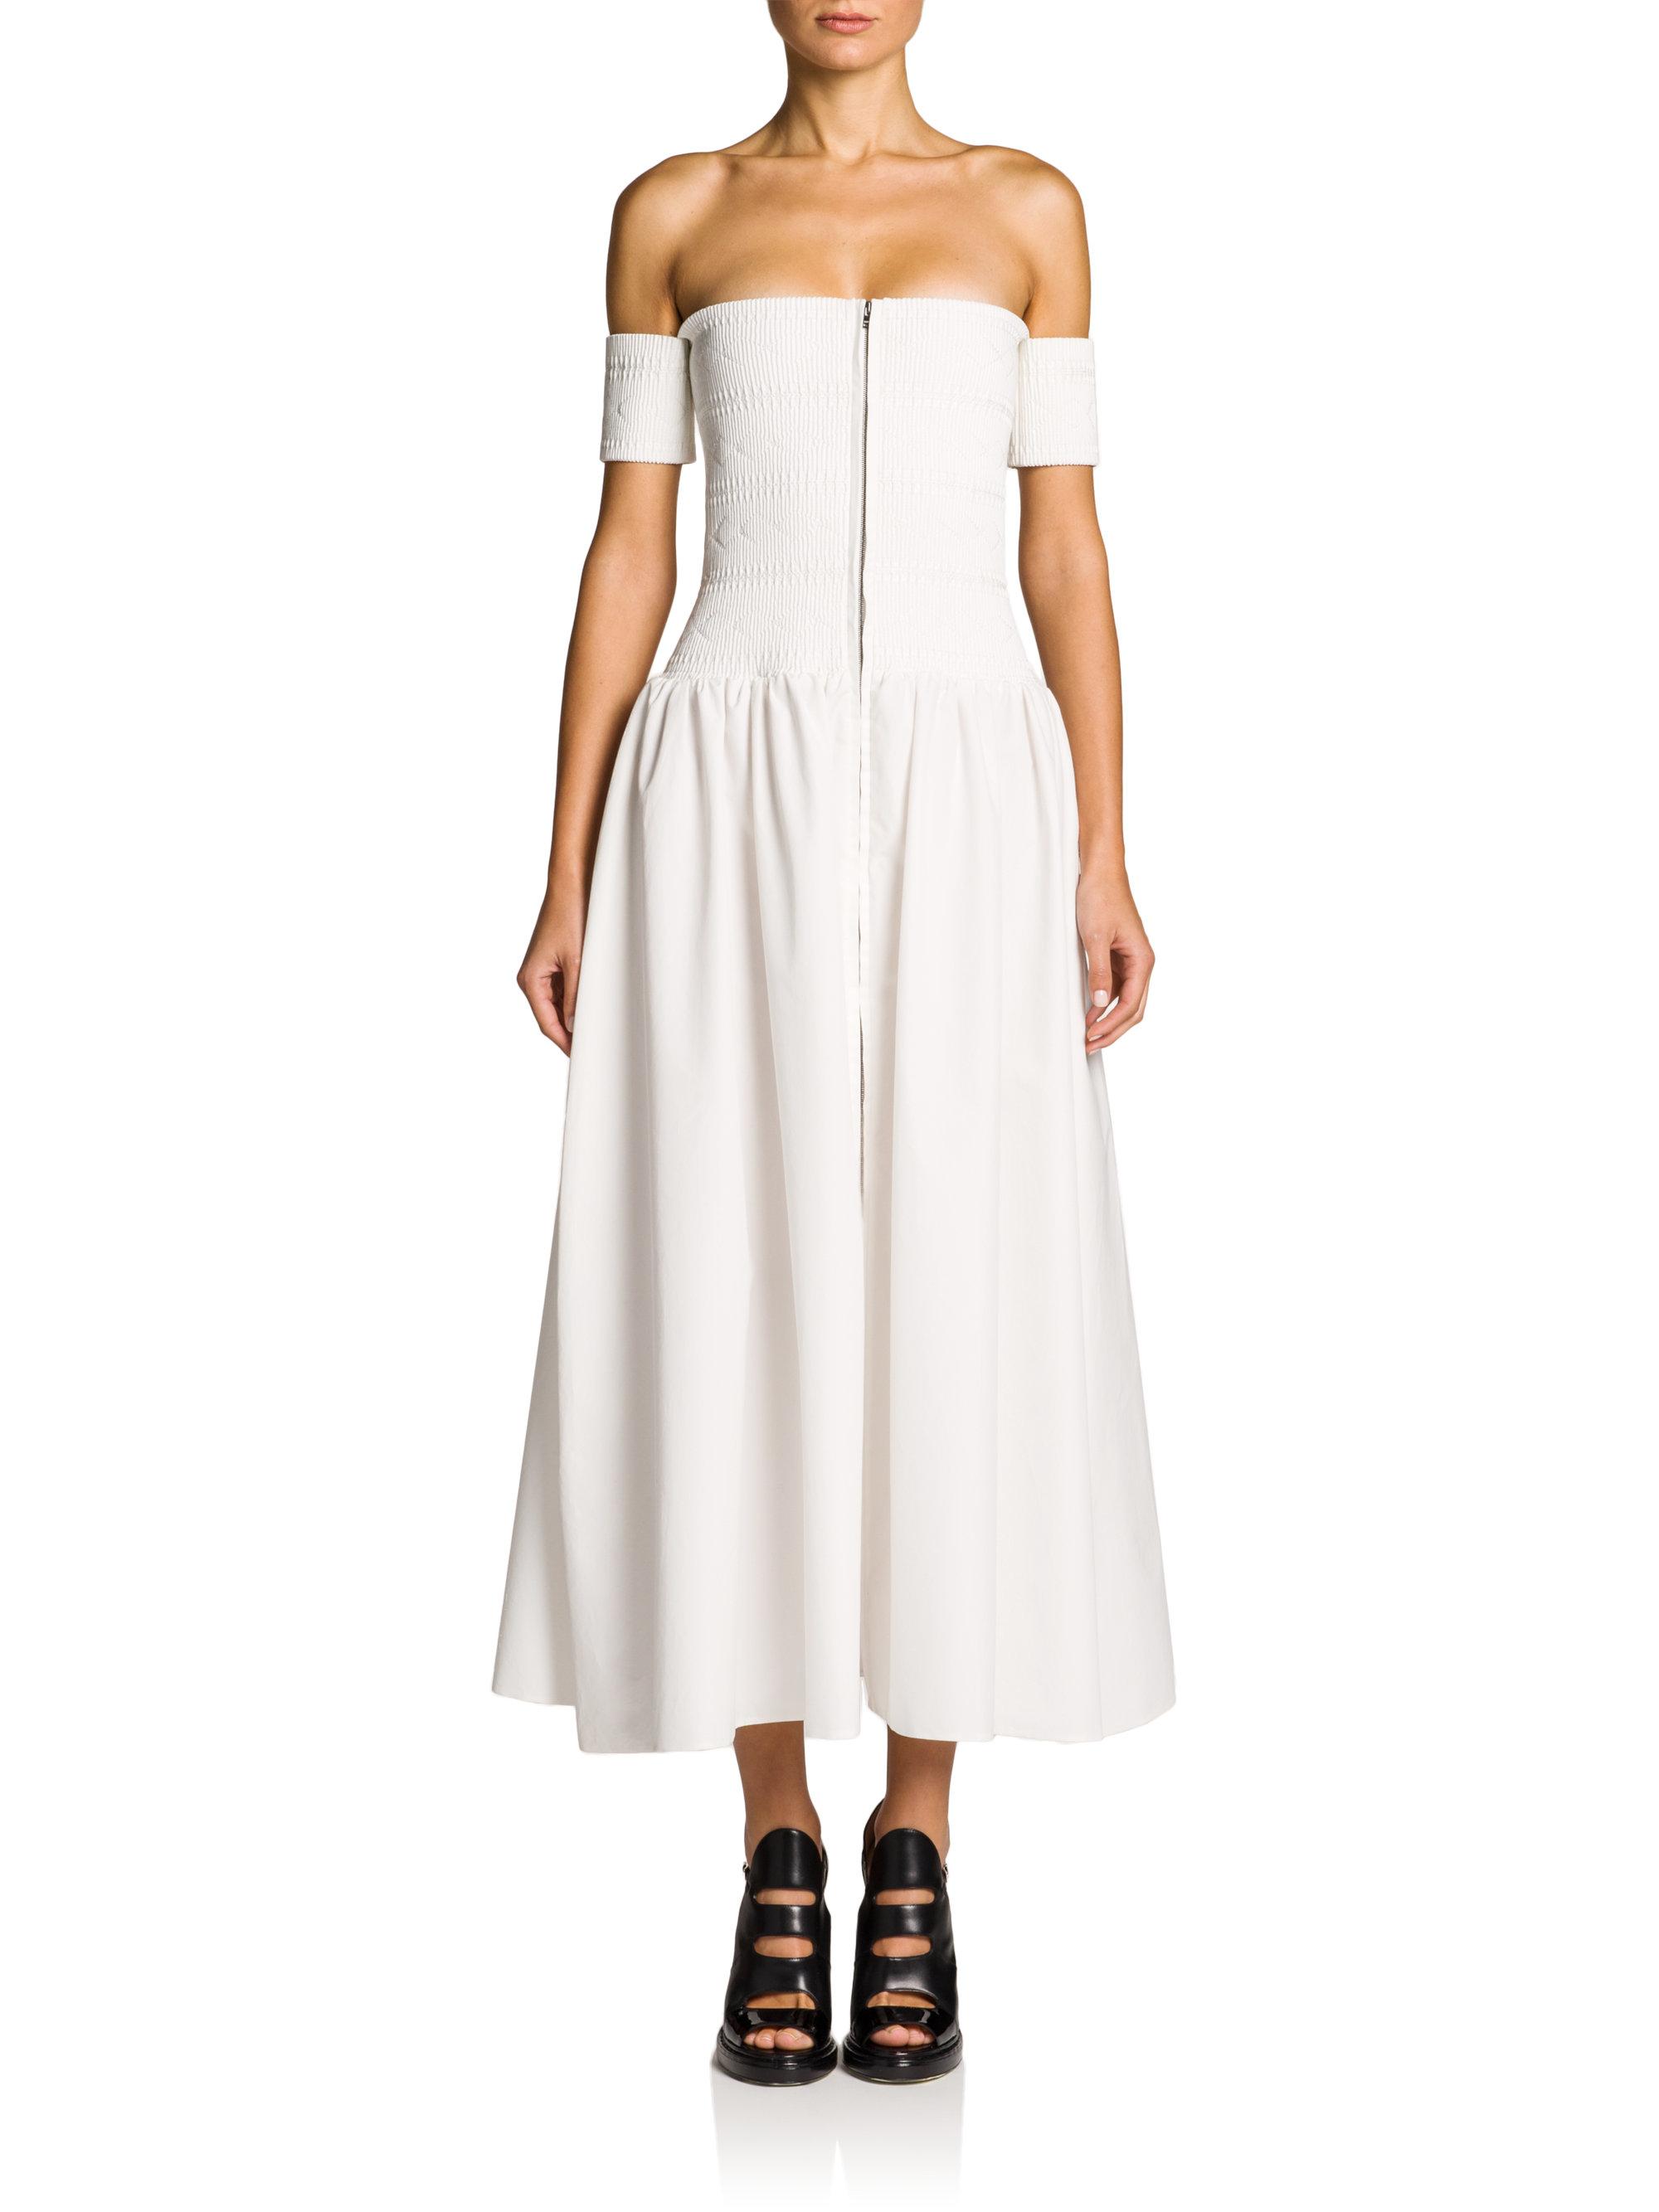 Lyst - Fendi Smocked Off-the-shoulder Midi Dress in White